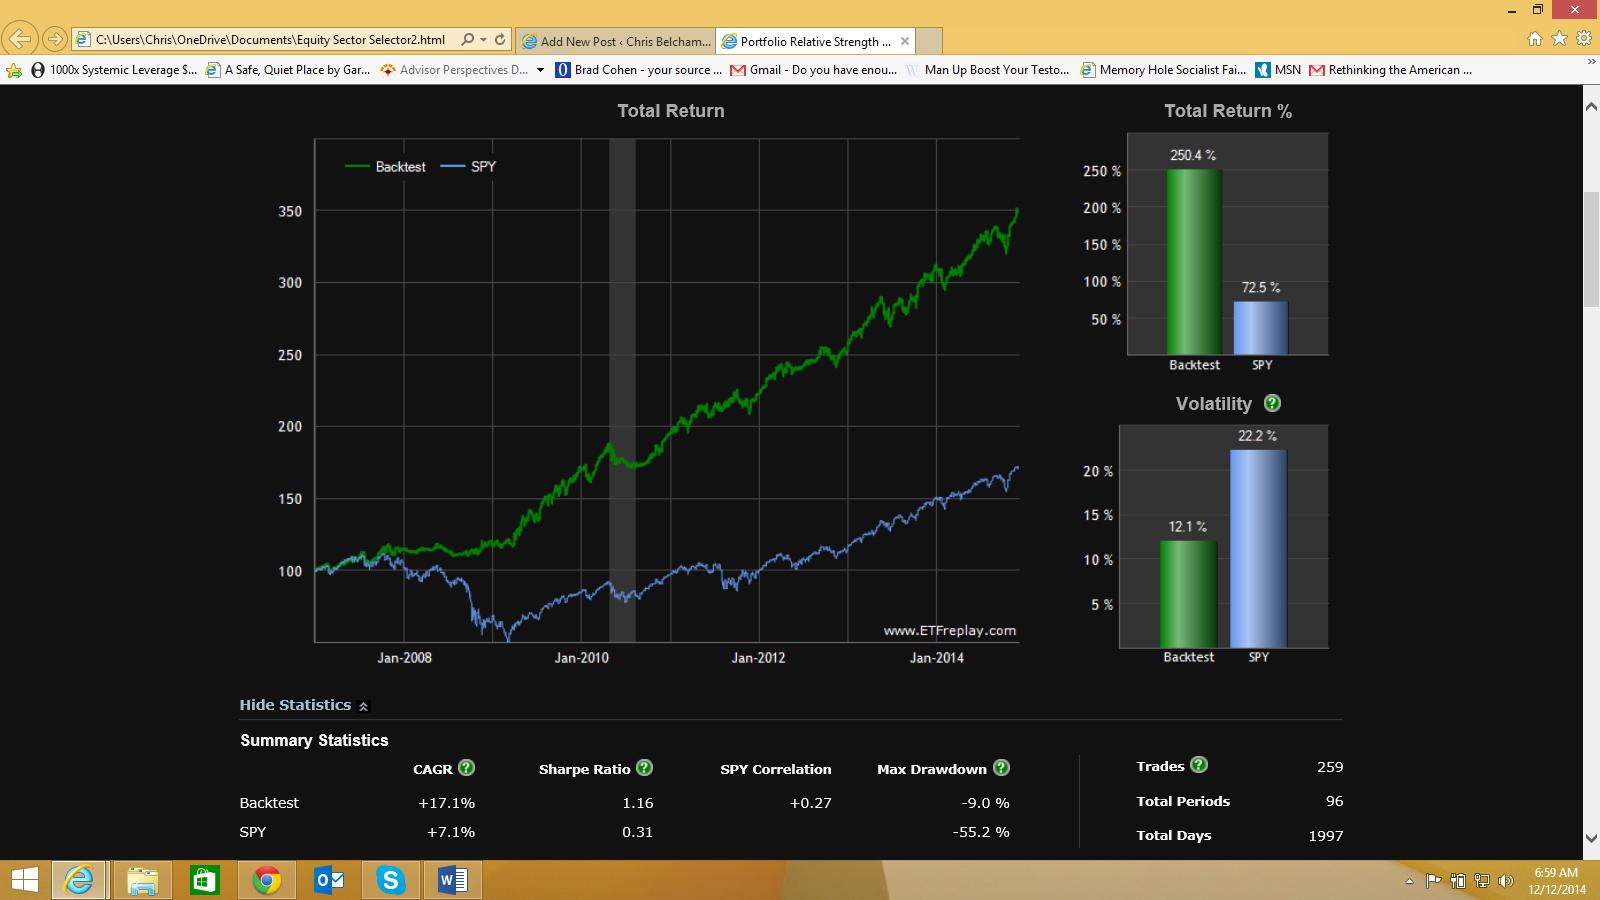 Equity Sector Selector